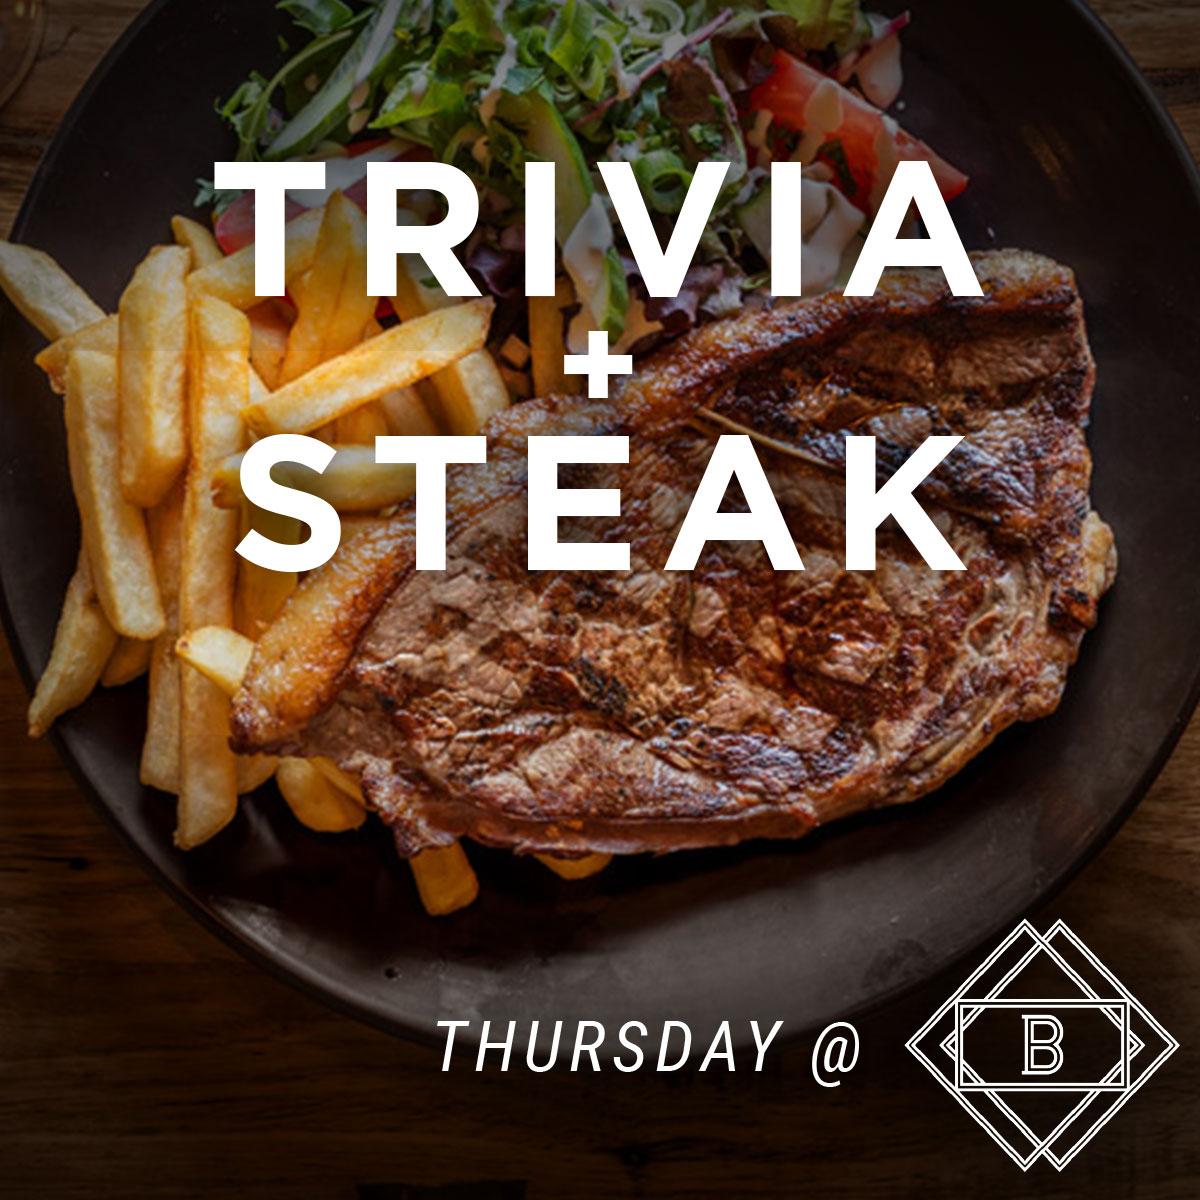 Trivia + Steak